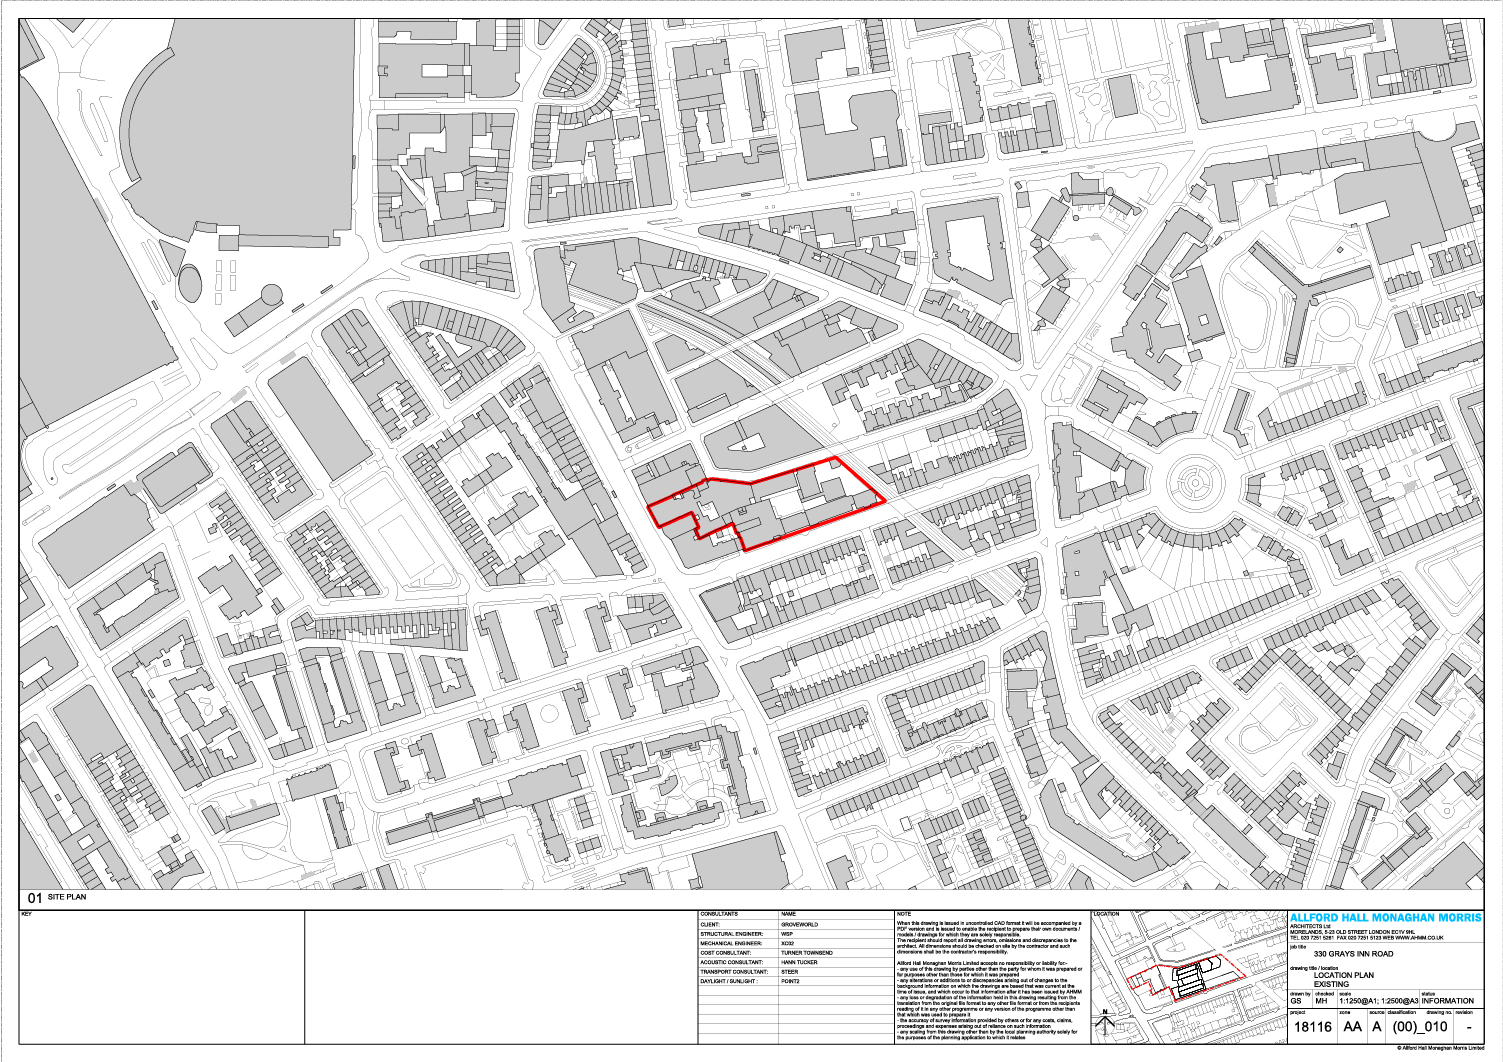 rntneh_map-01.jpg